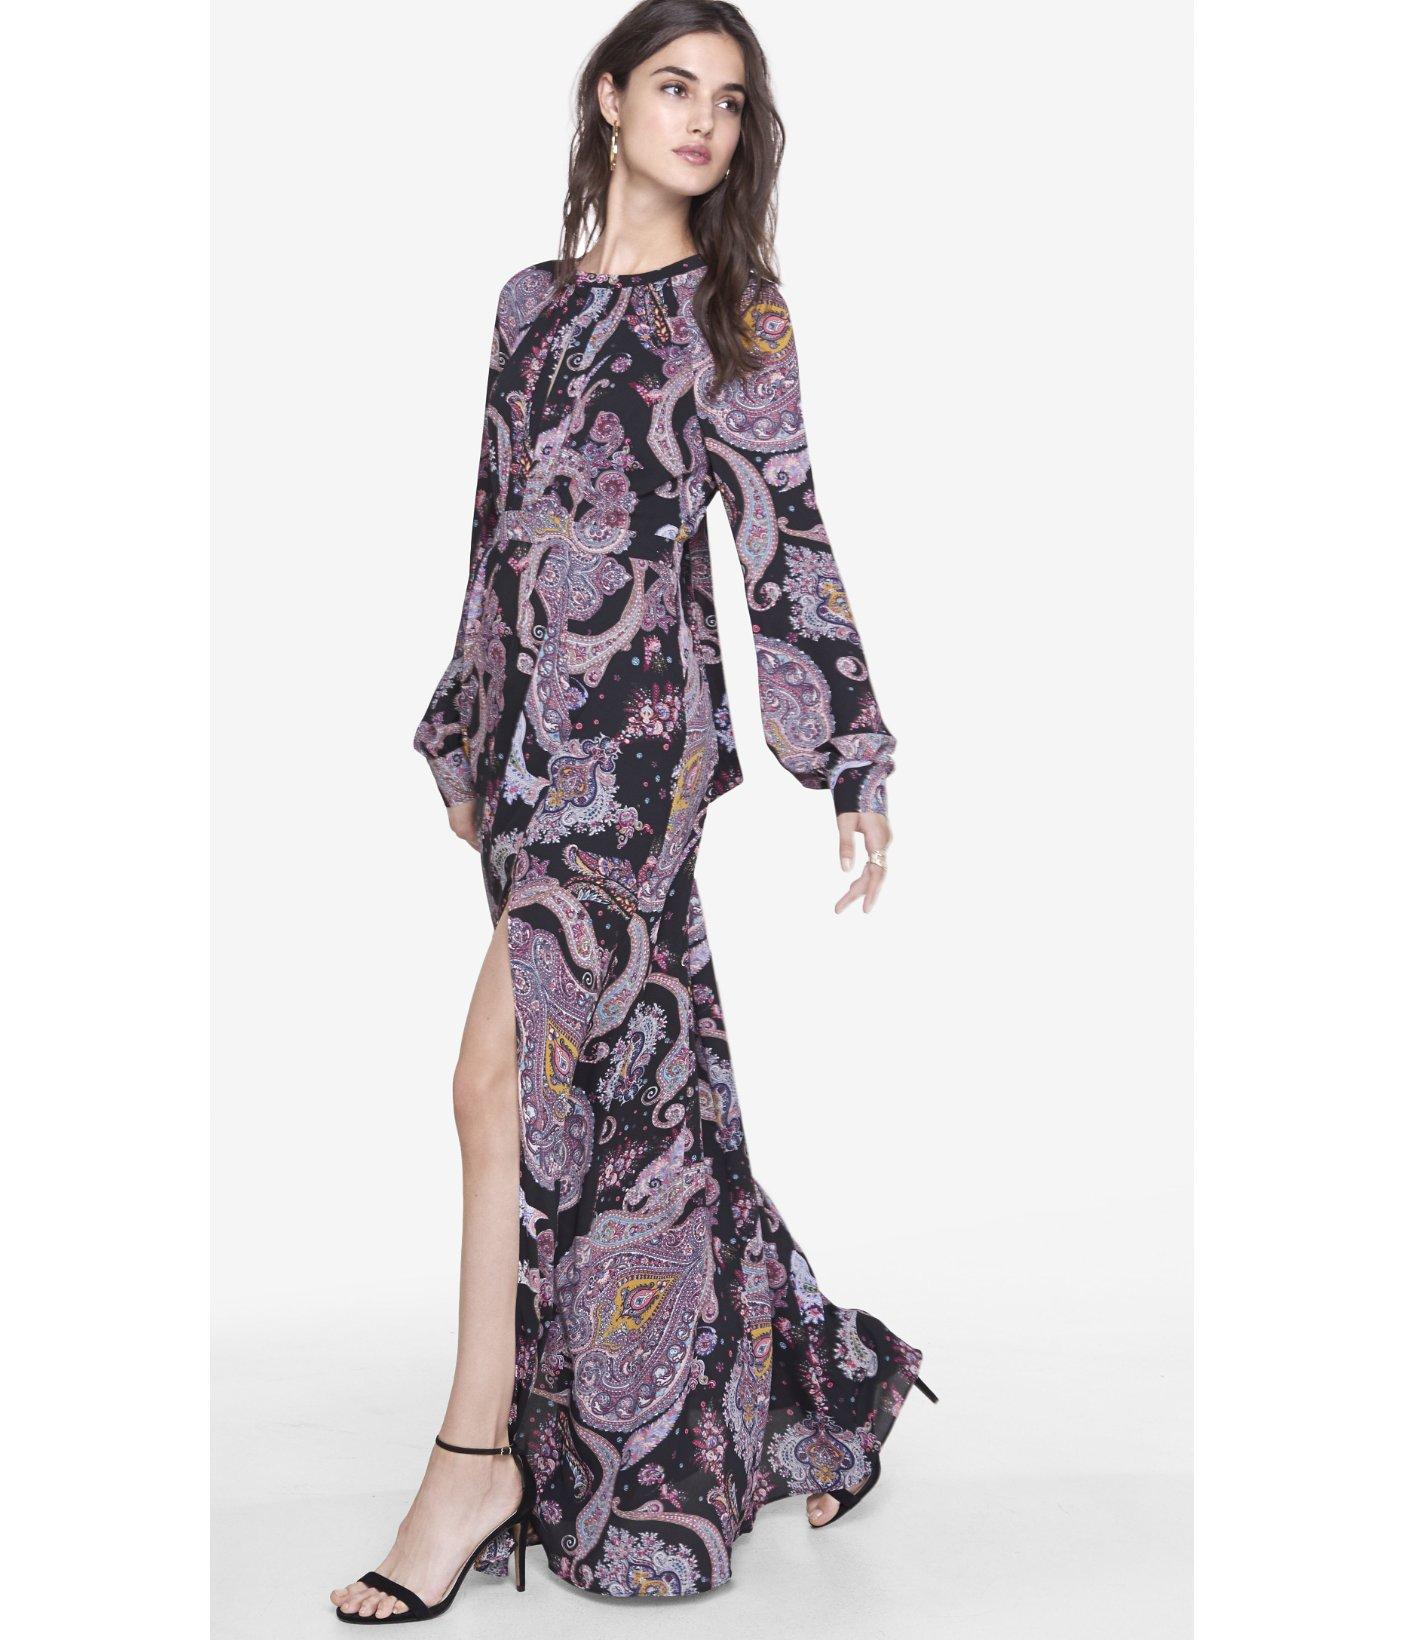 Express Paisley Poet Sleeve Maxi Dress in Black - Lyst